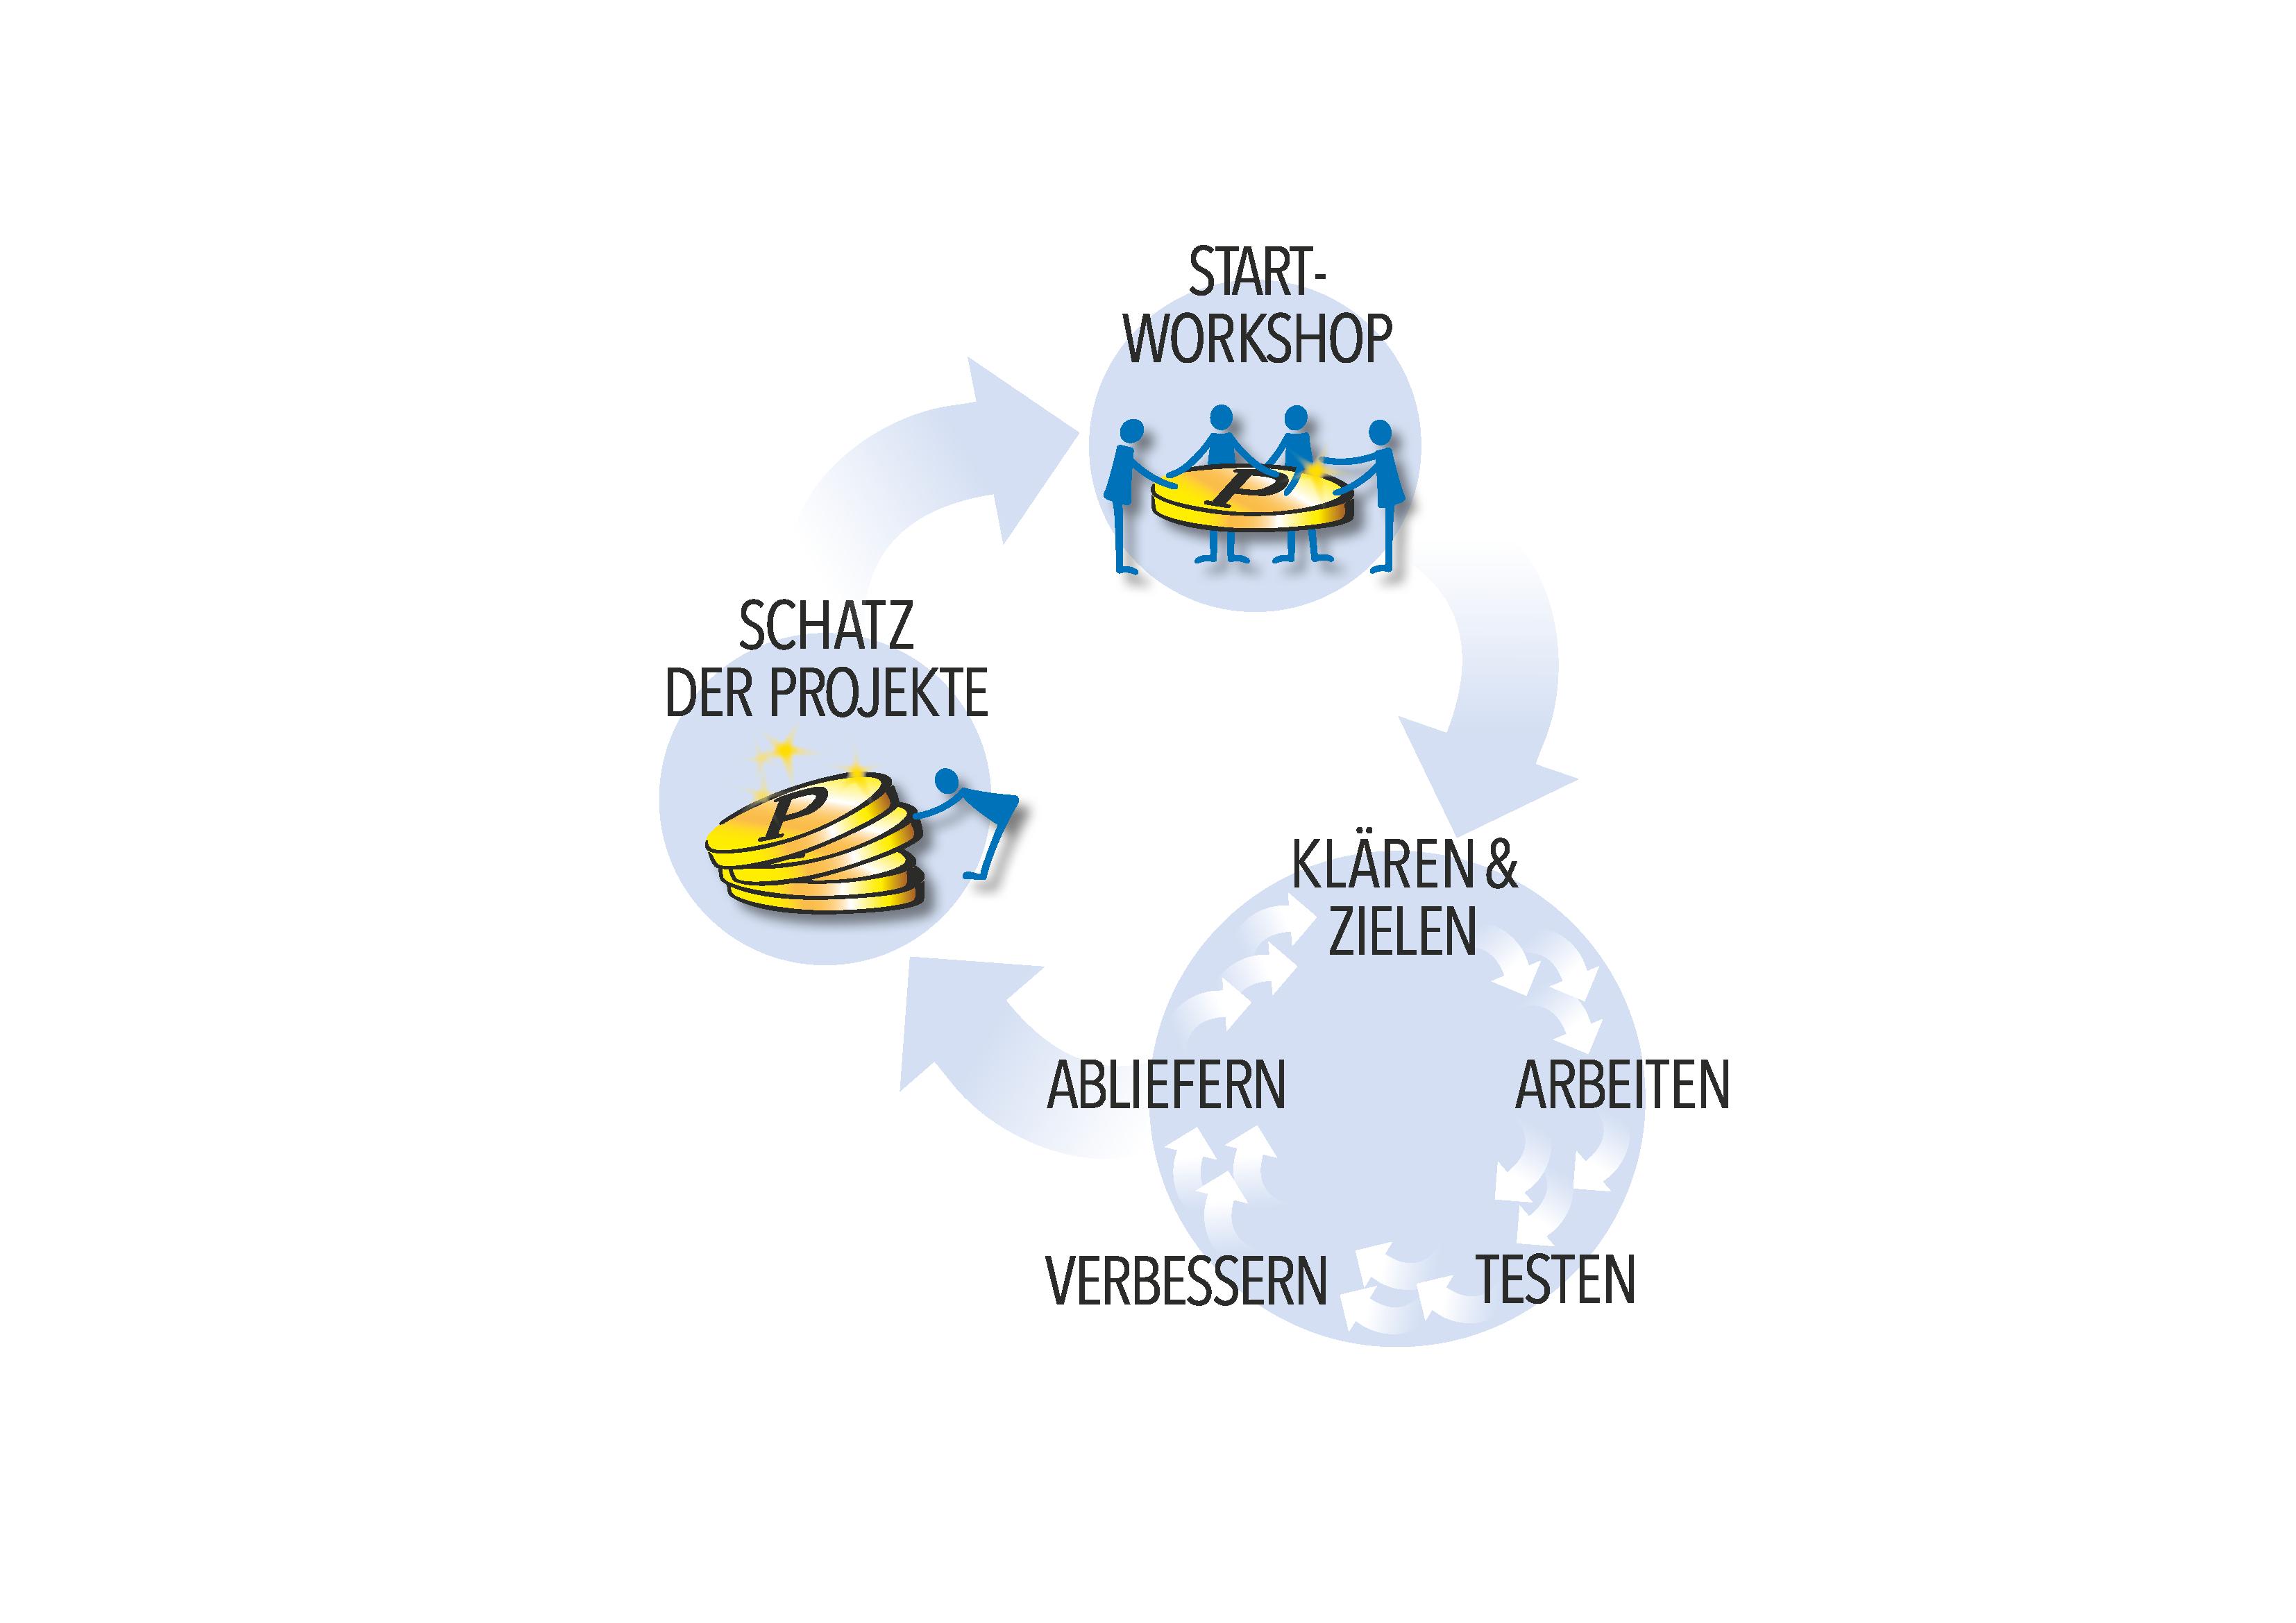 projektschatz-kreislauf_rz_2018-12-04